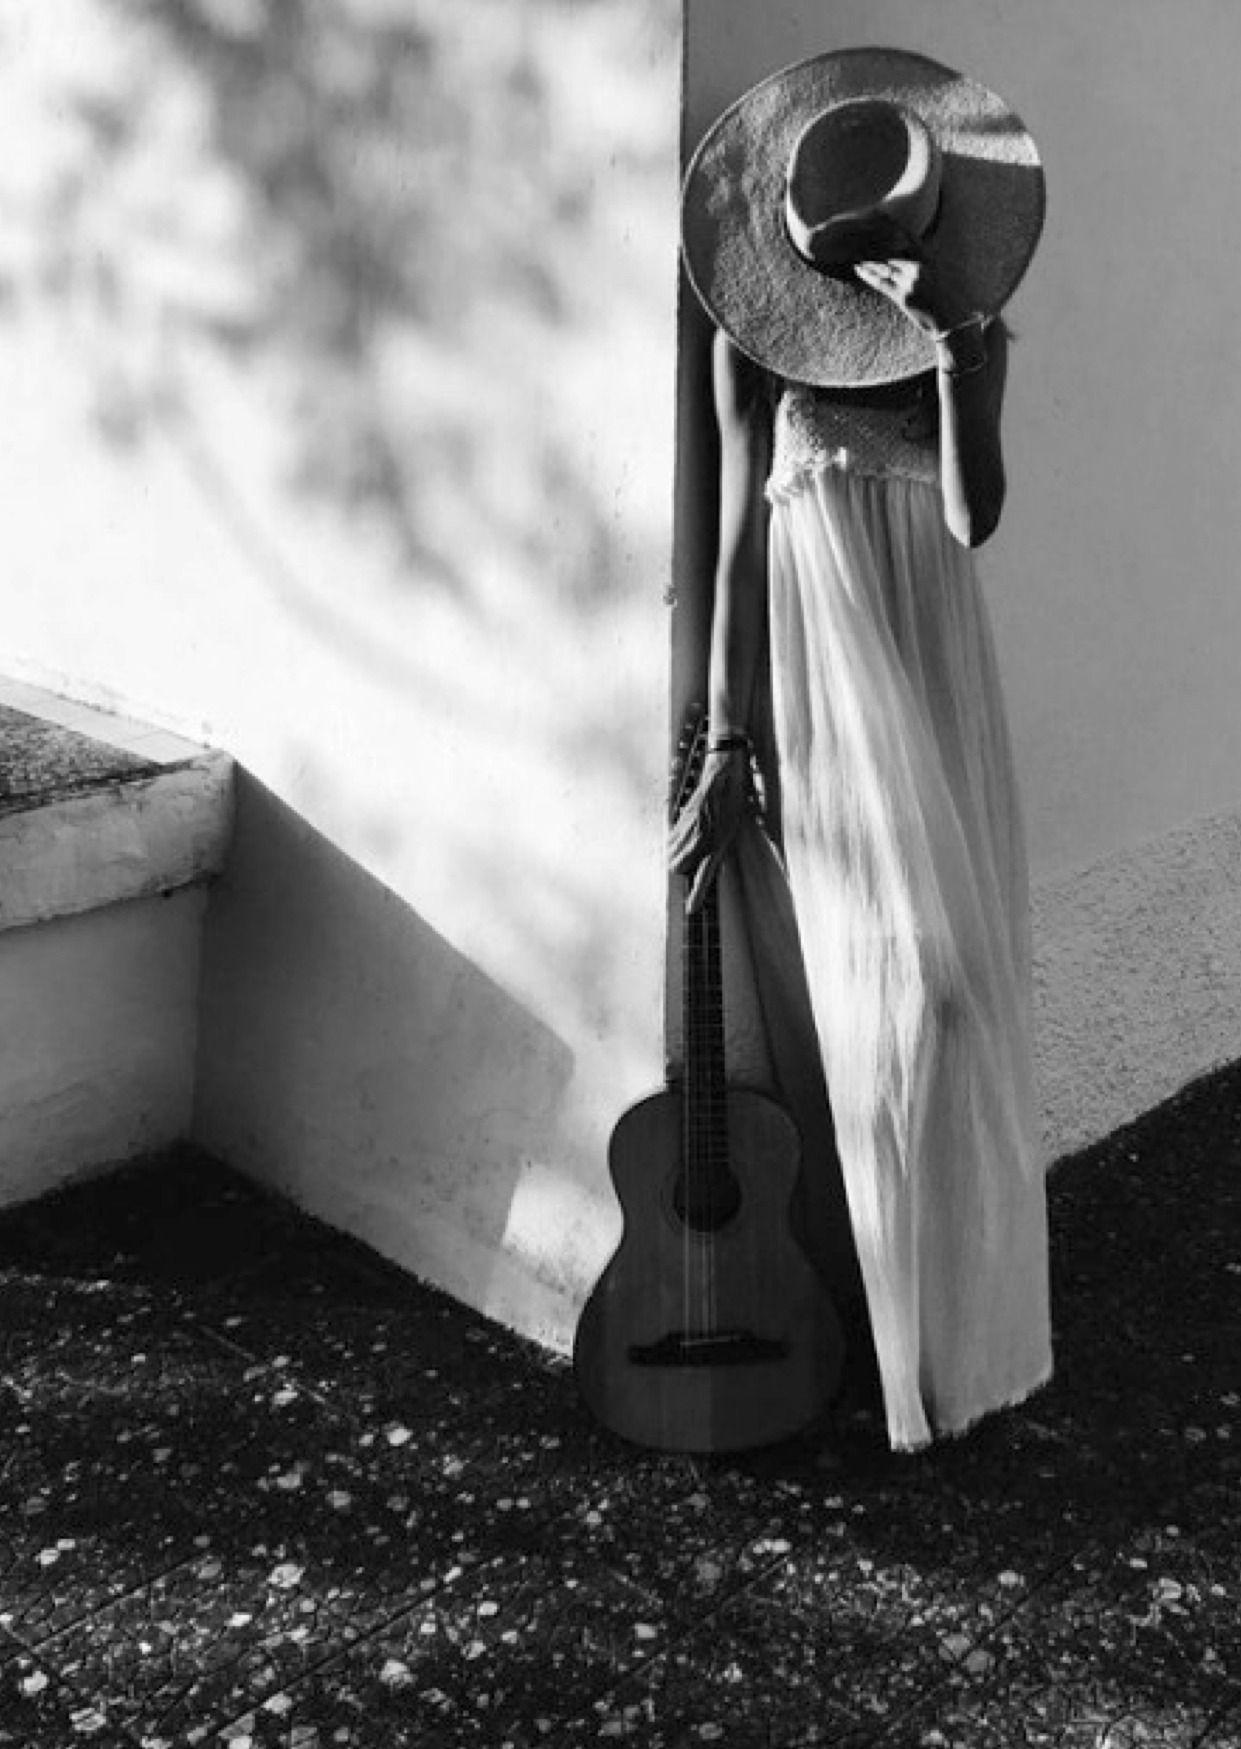 Pace Bianco E Nero the art of living : photo | foto in bianco e nero, bianco e nero